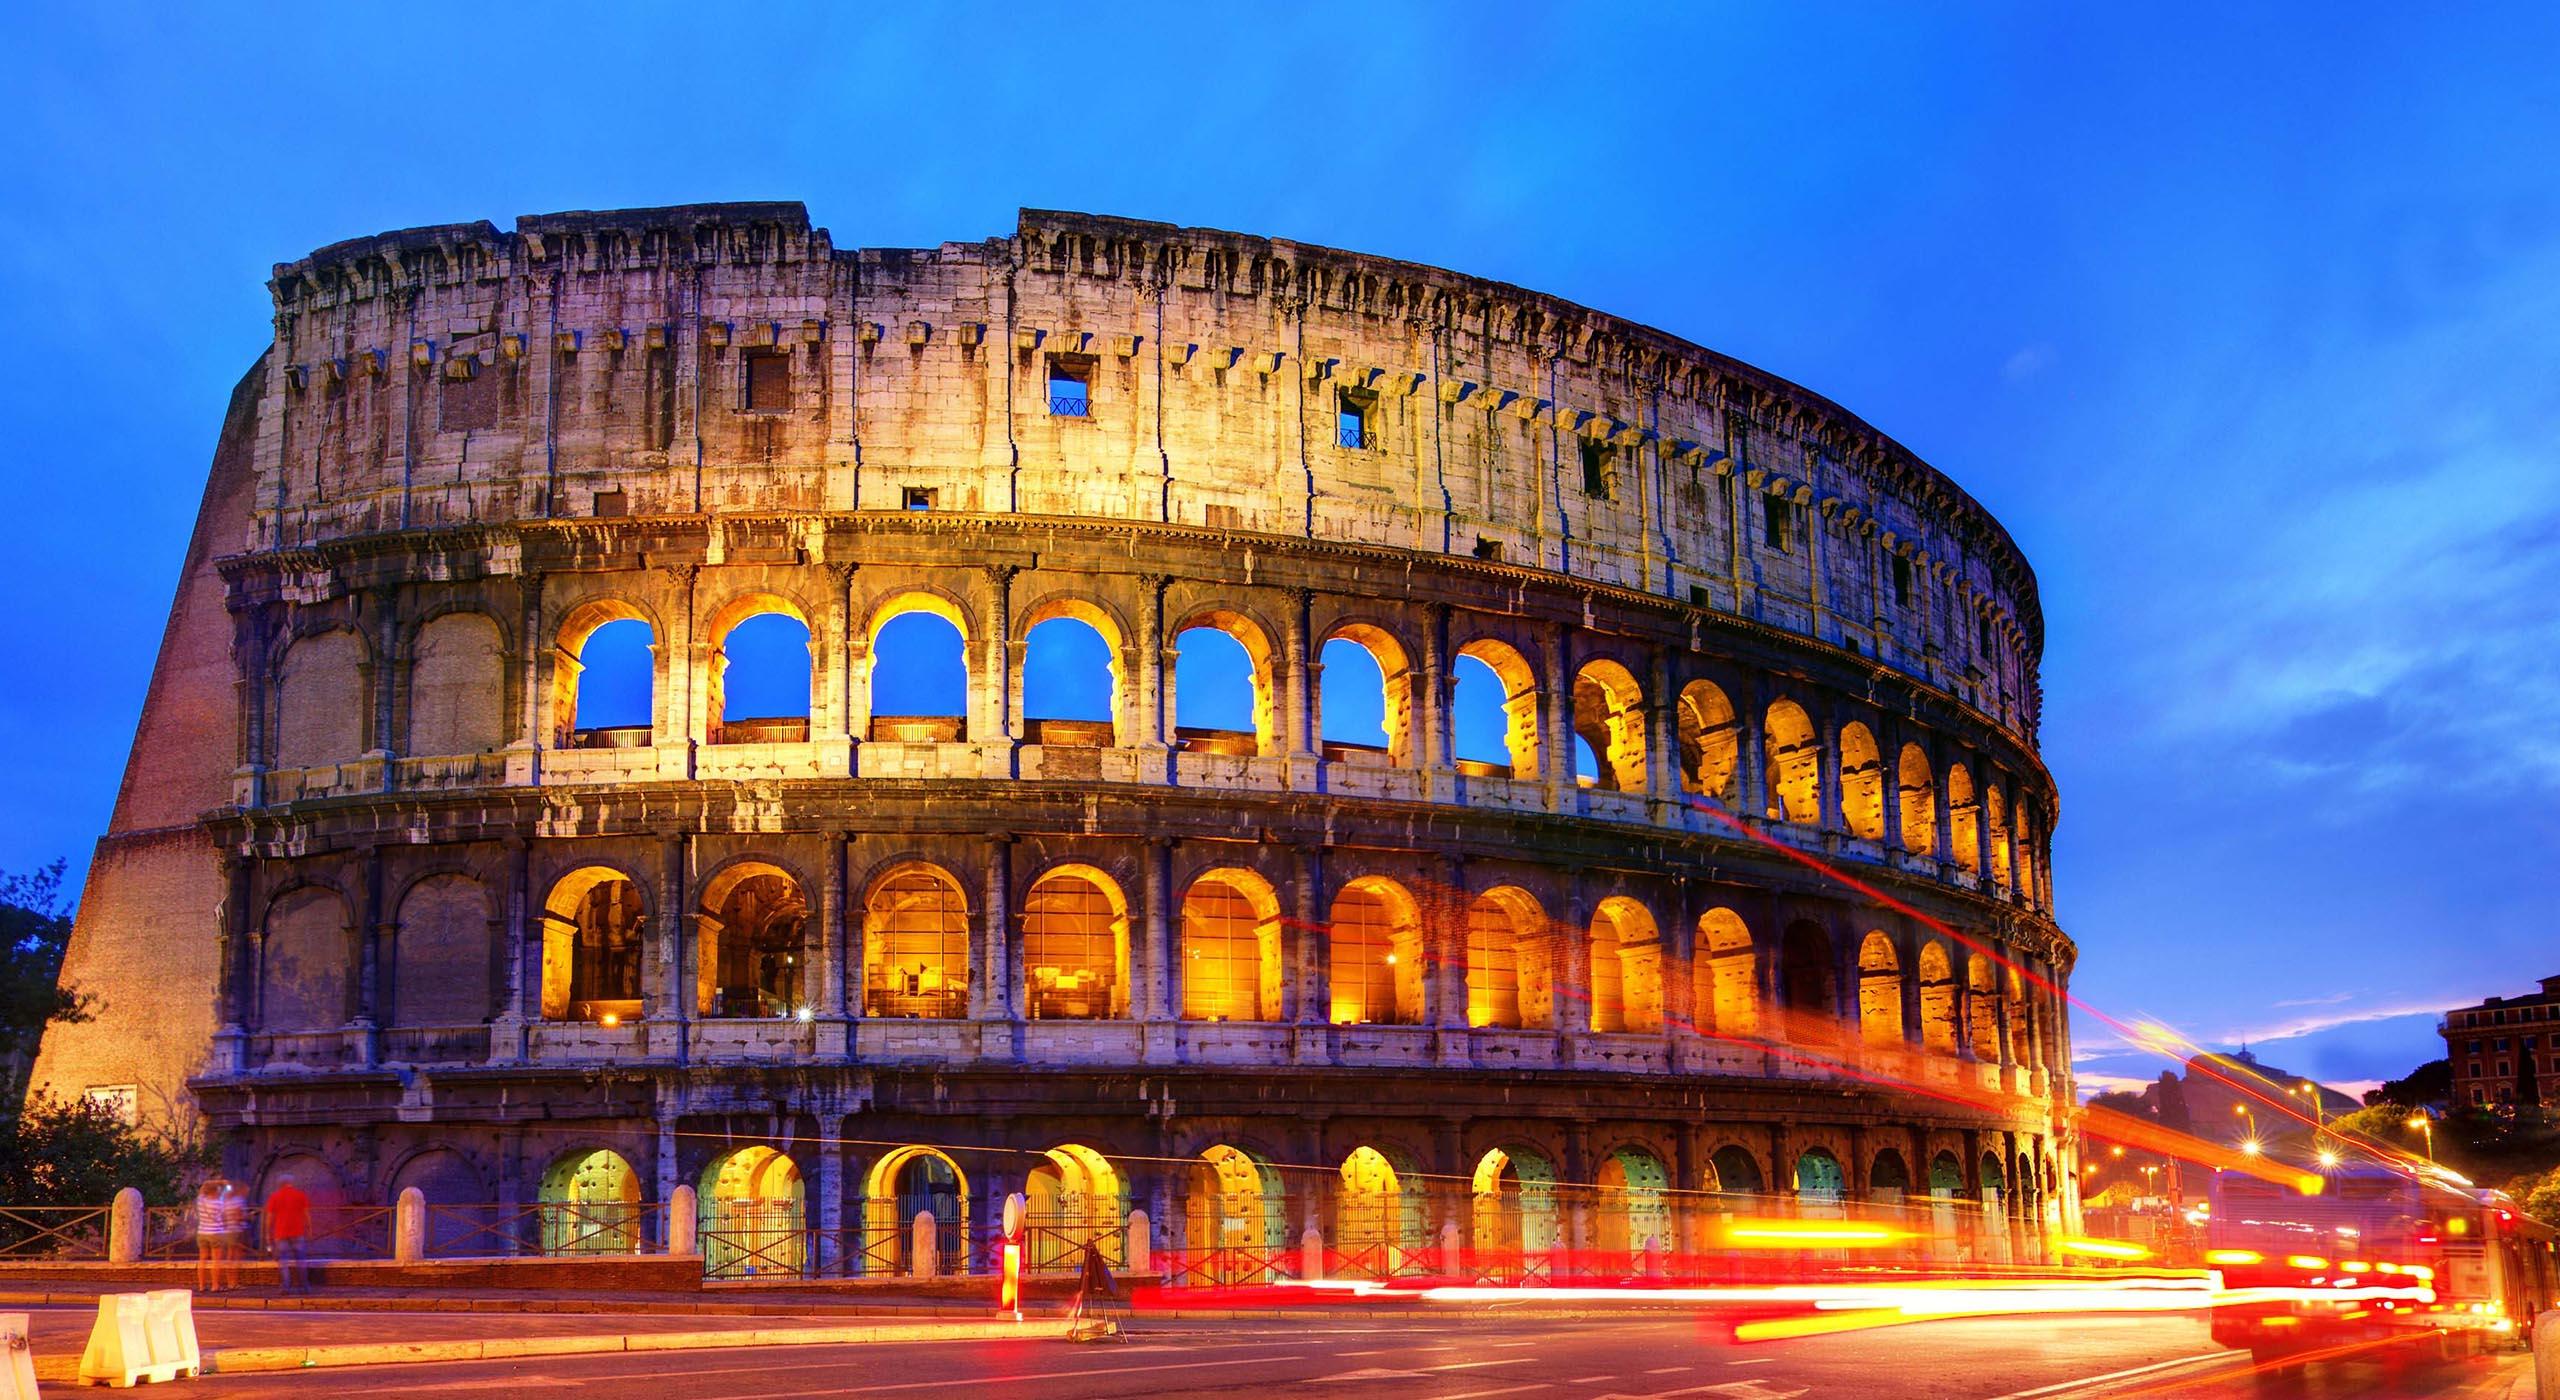 NEXT OPENING ROMA